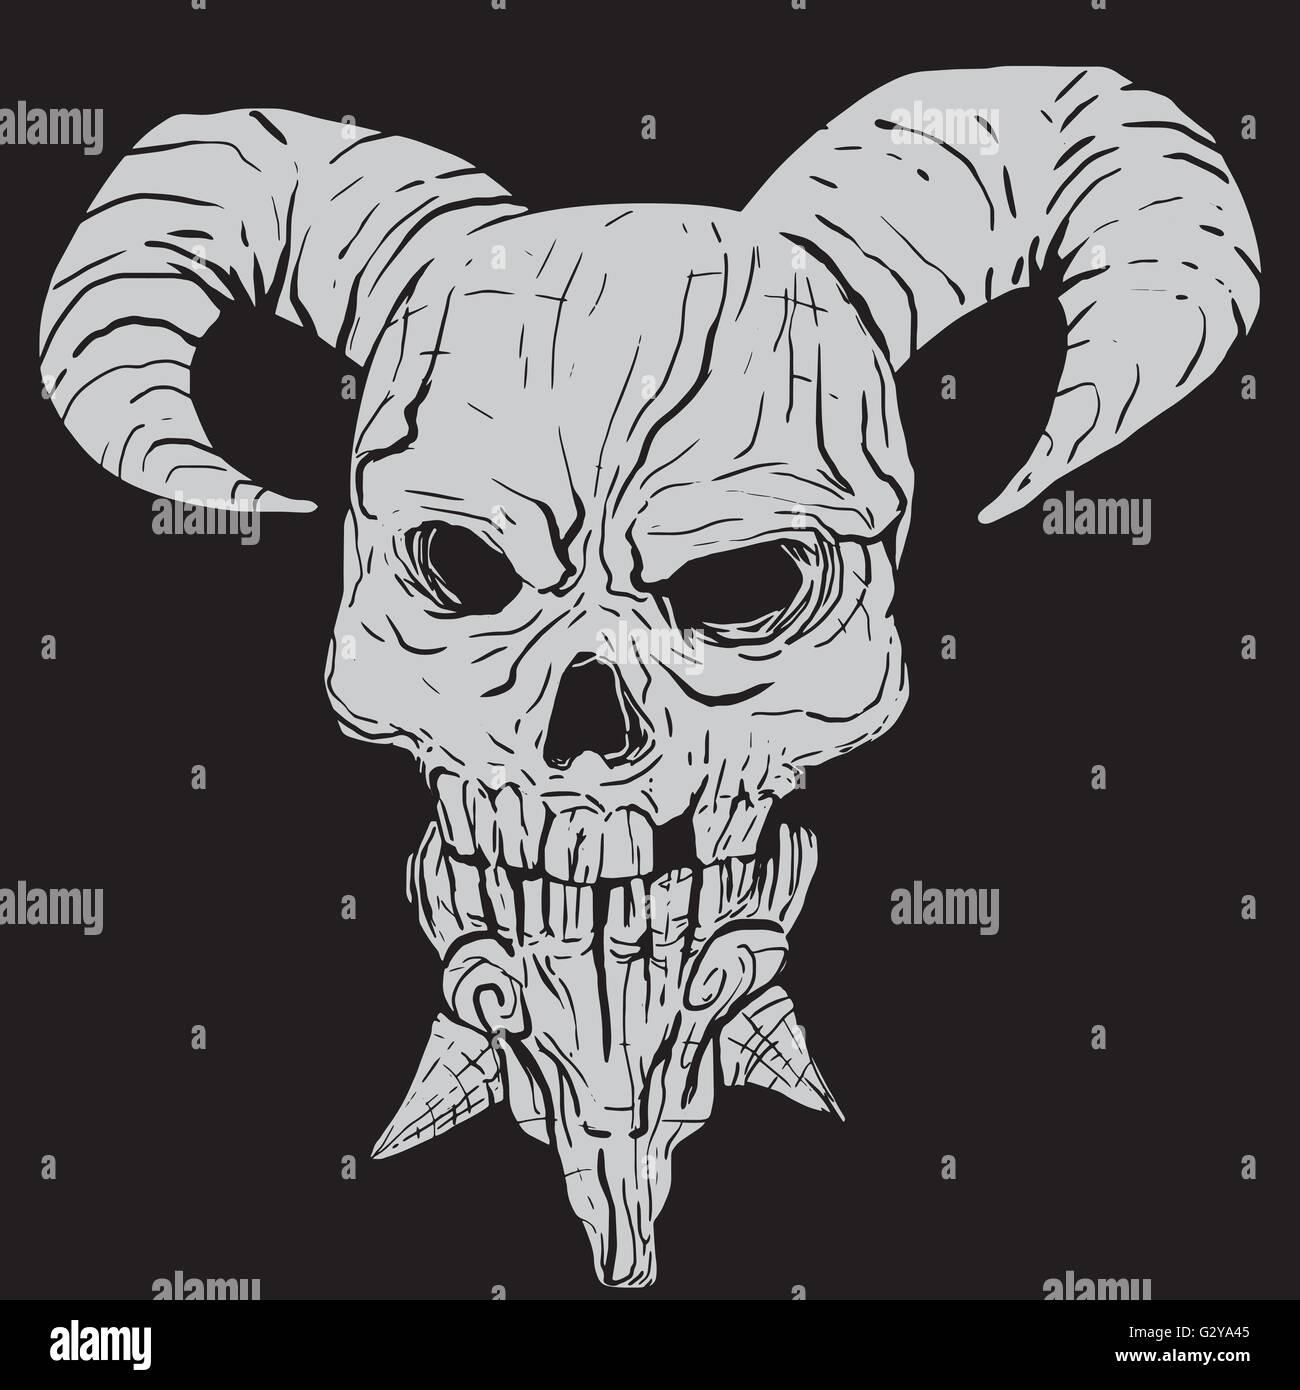 demon skull stock vector art illustration vector image 105092181